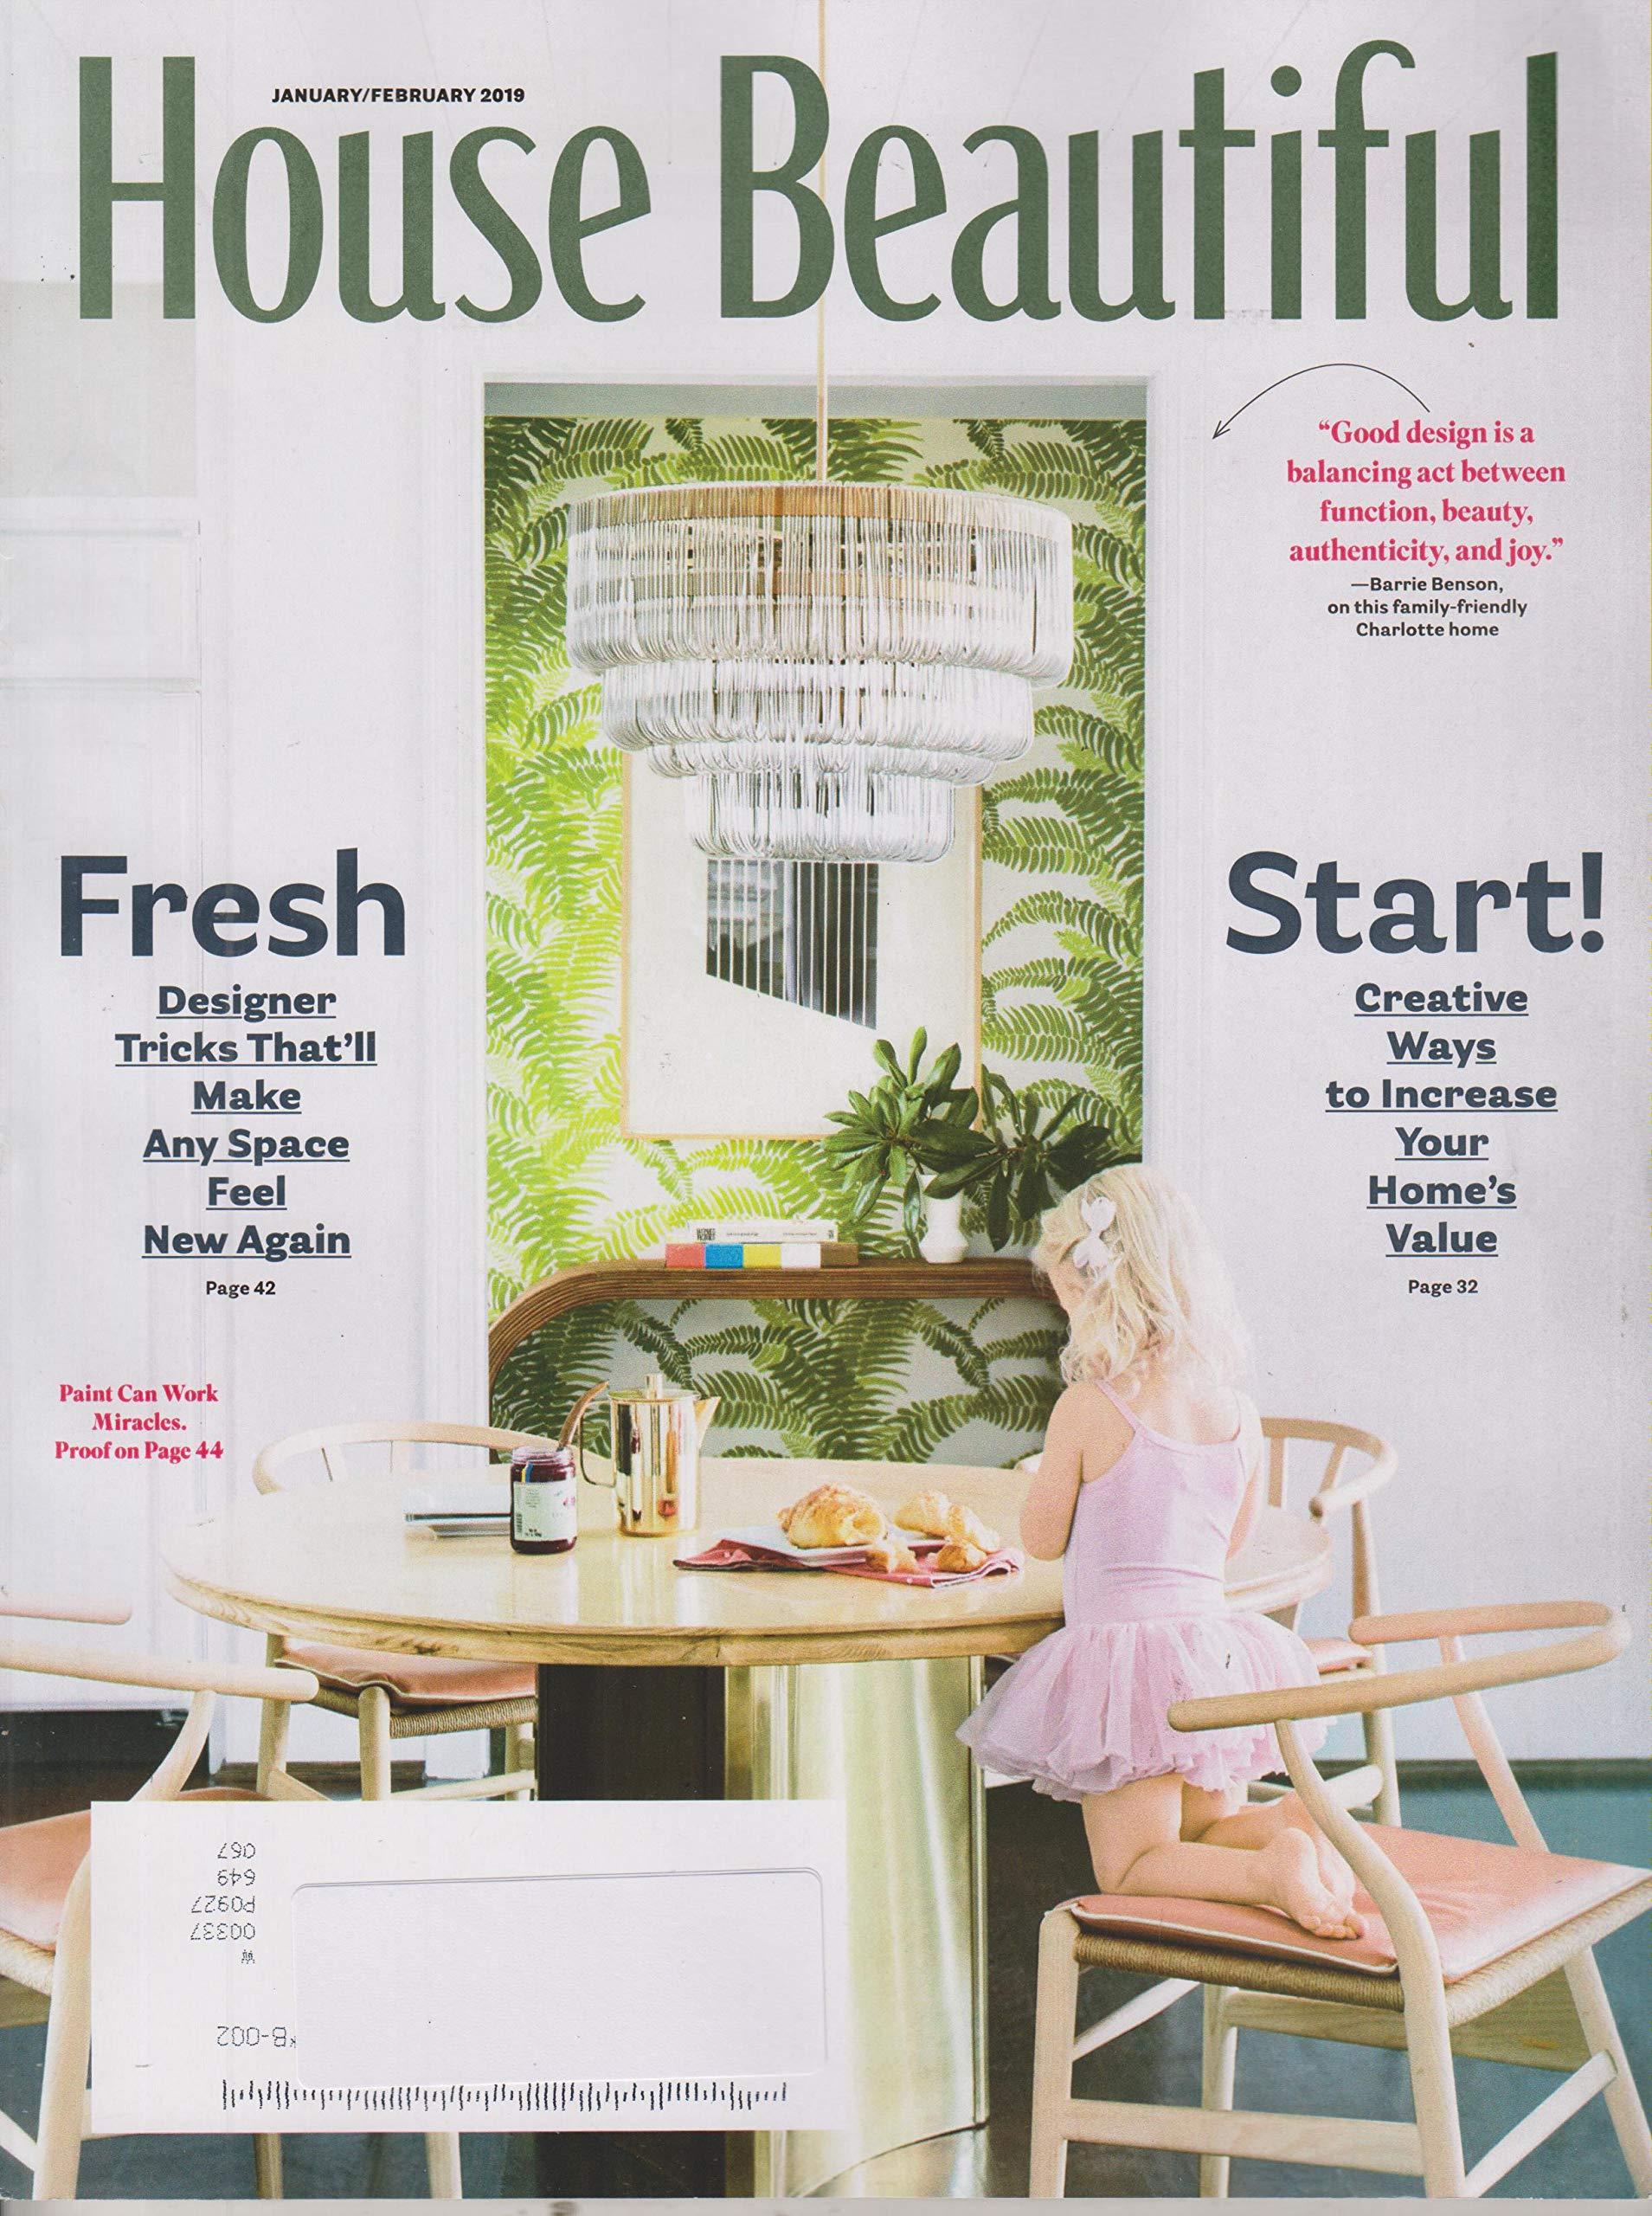 House Beautiful January/February 2019 Fresh Start!